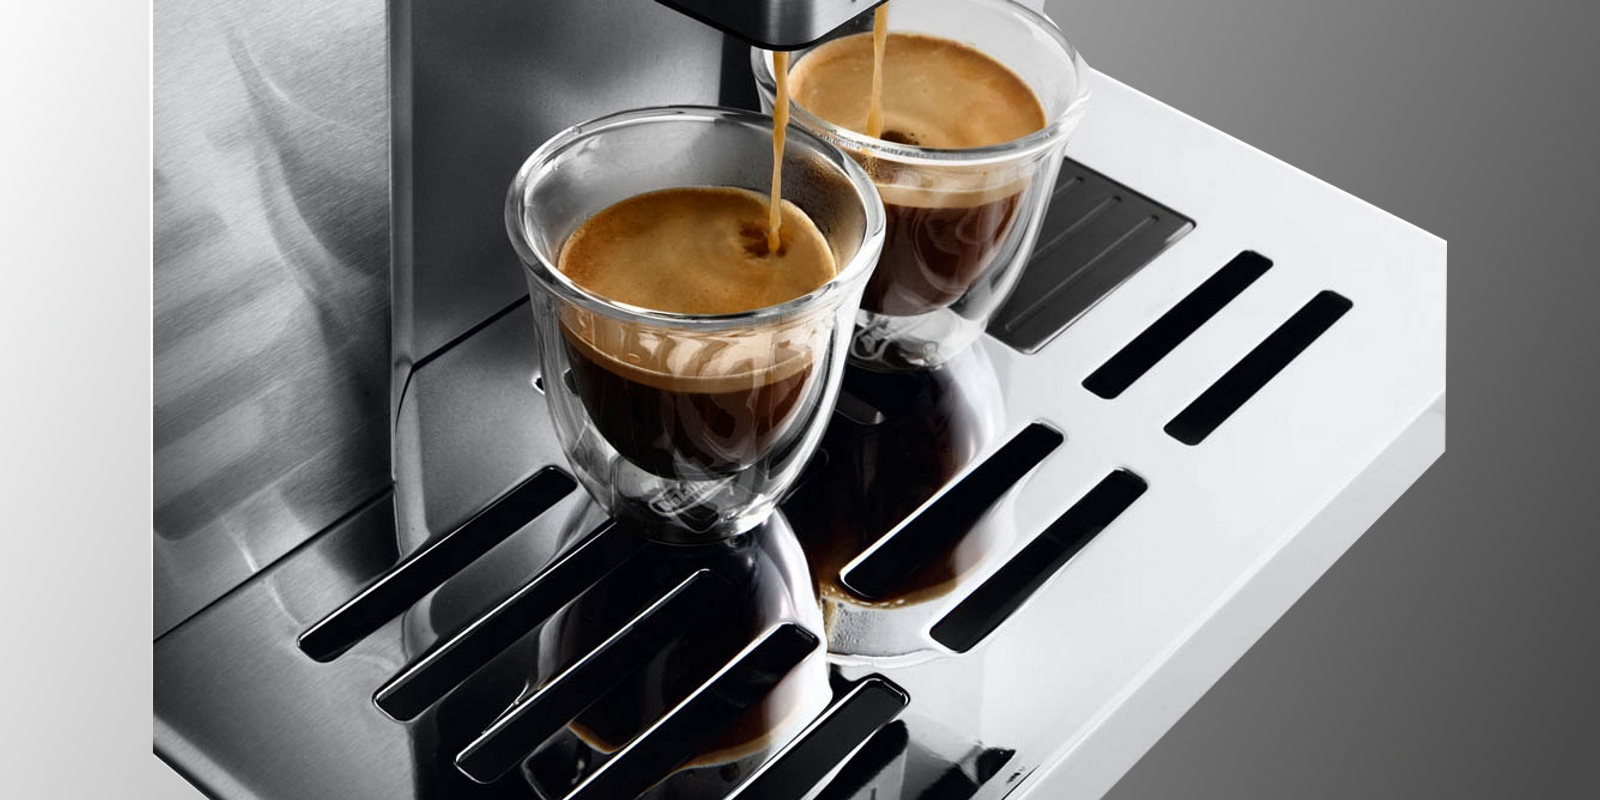 https://hdo-gmbh.com/wp-content/uploads/HDO_Produkte_haushaltsgeraete_Kaffeevollautomat_Abdeckung_1600x800-2.jpg